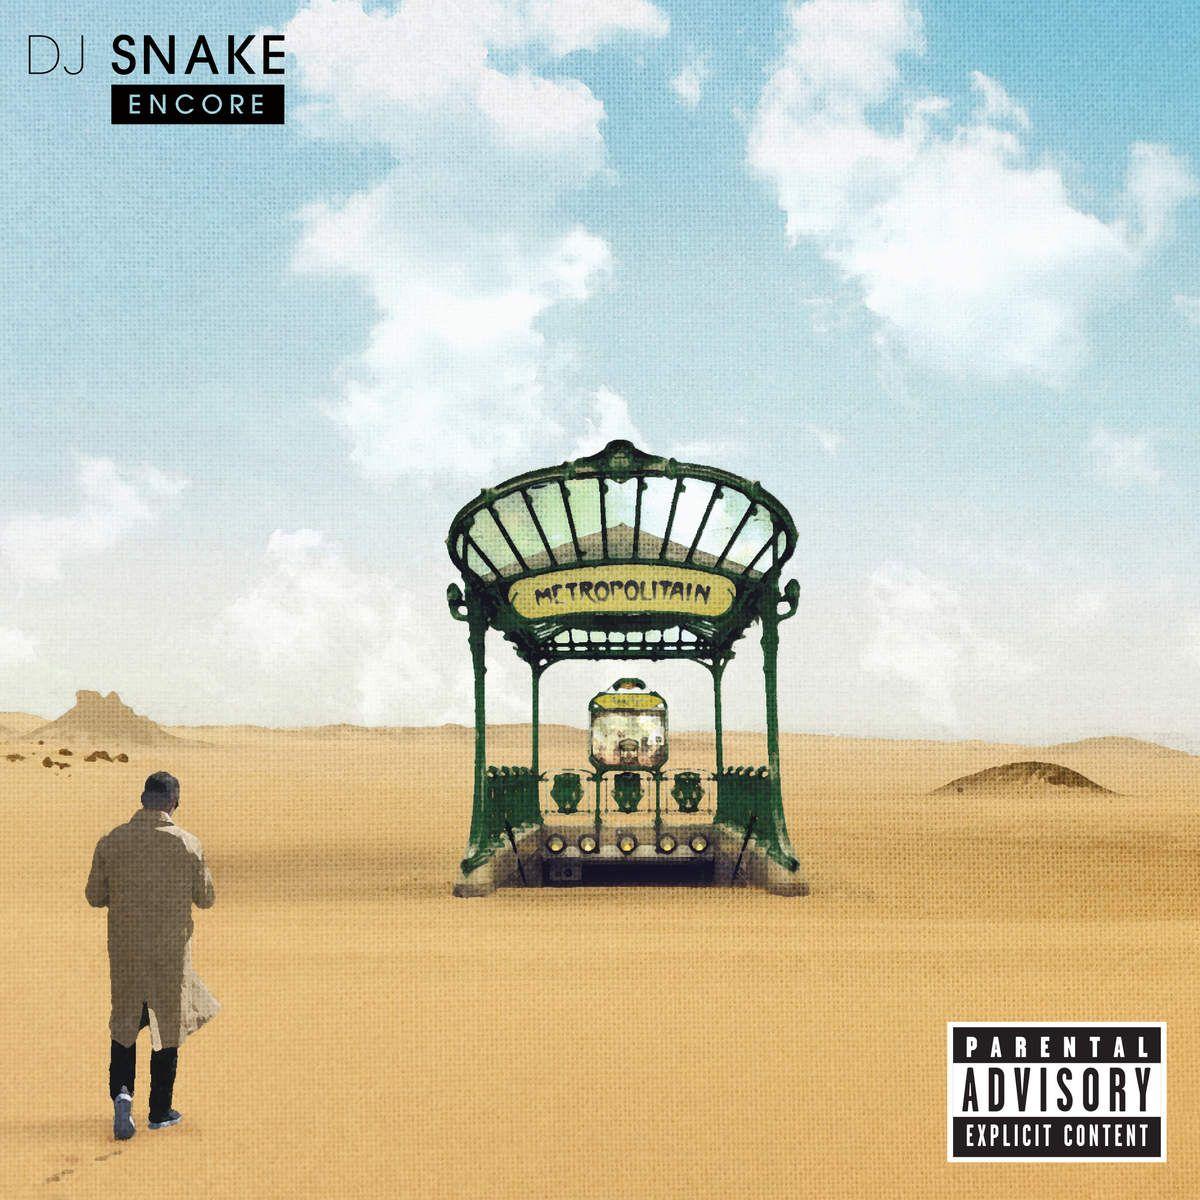 DJ Snake - Encore album cover